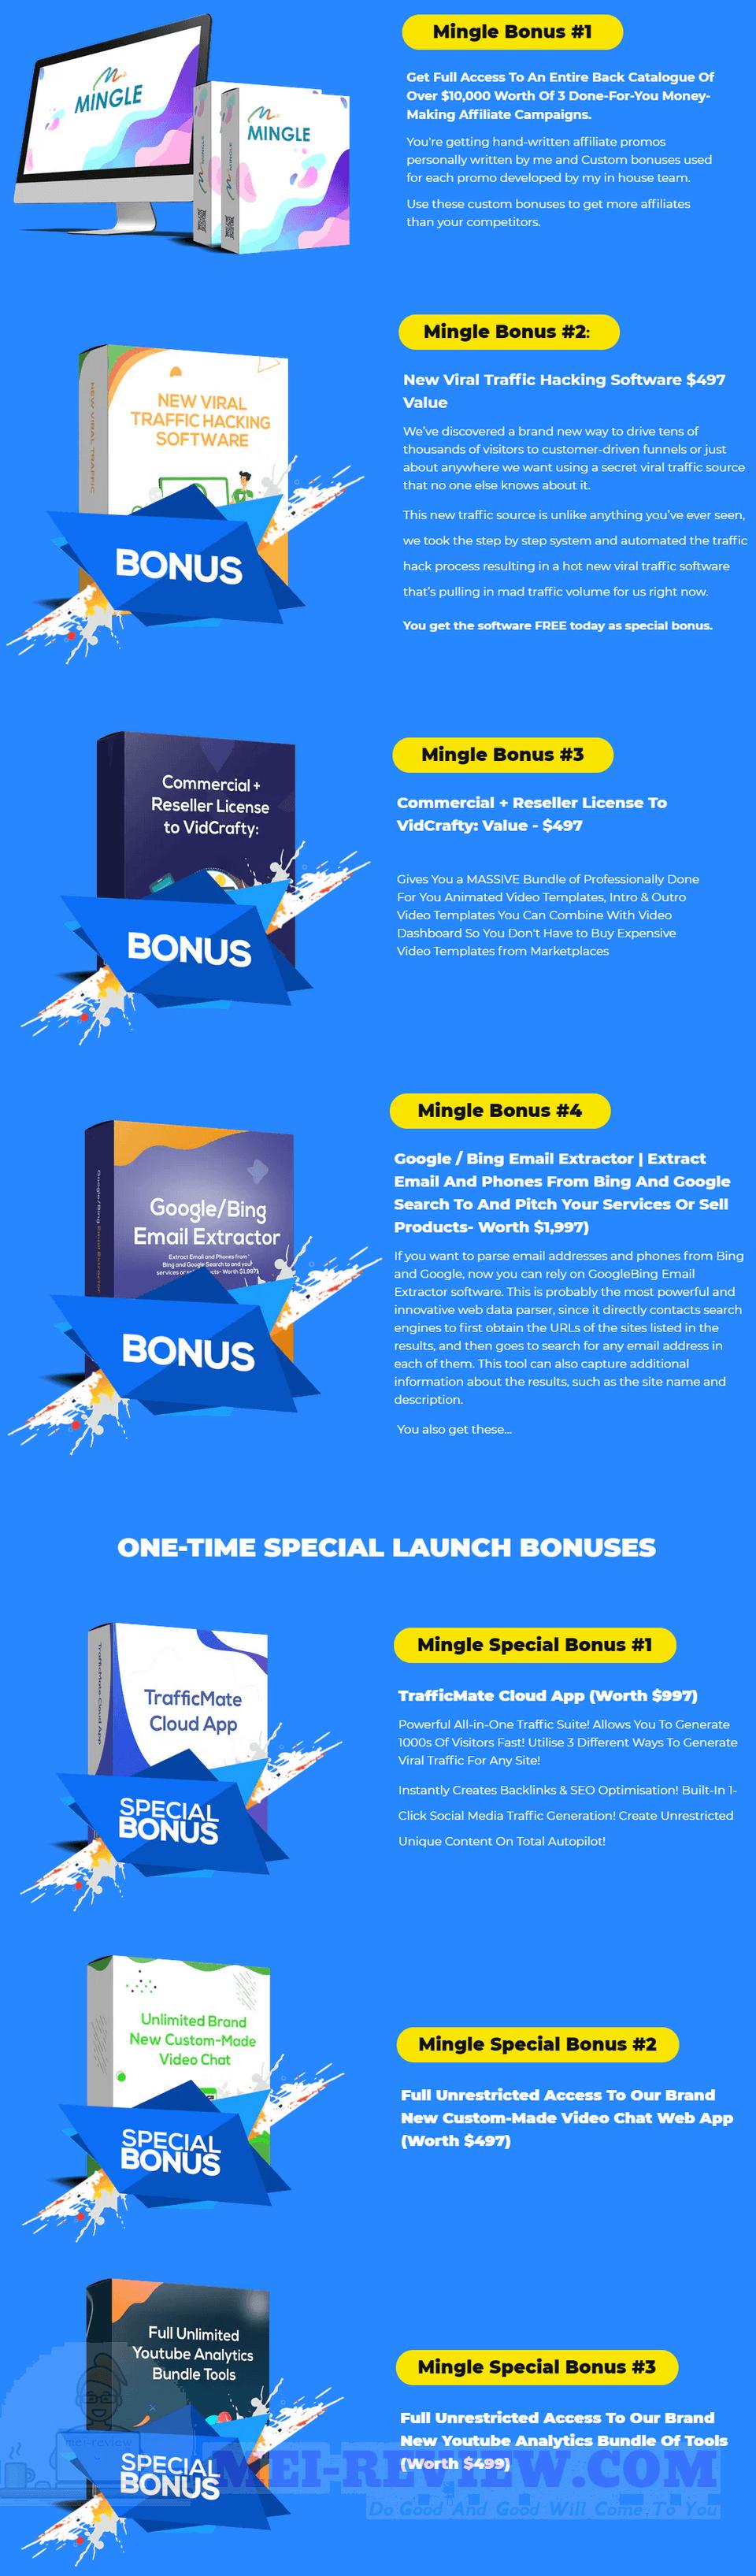 Mingle-bonus